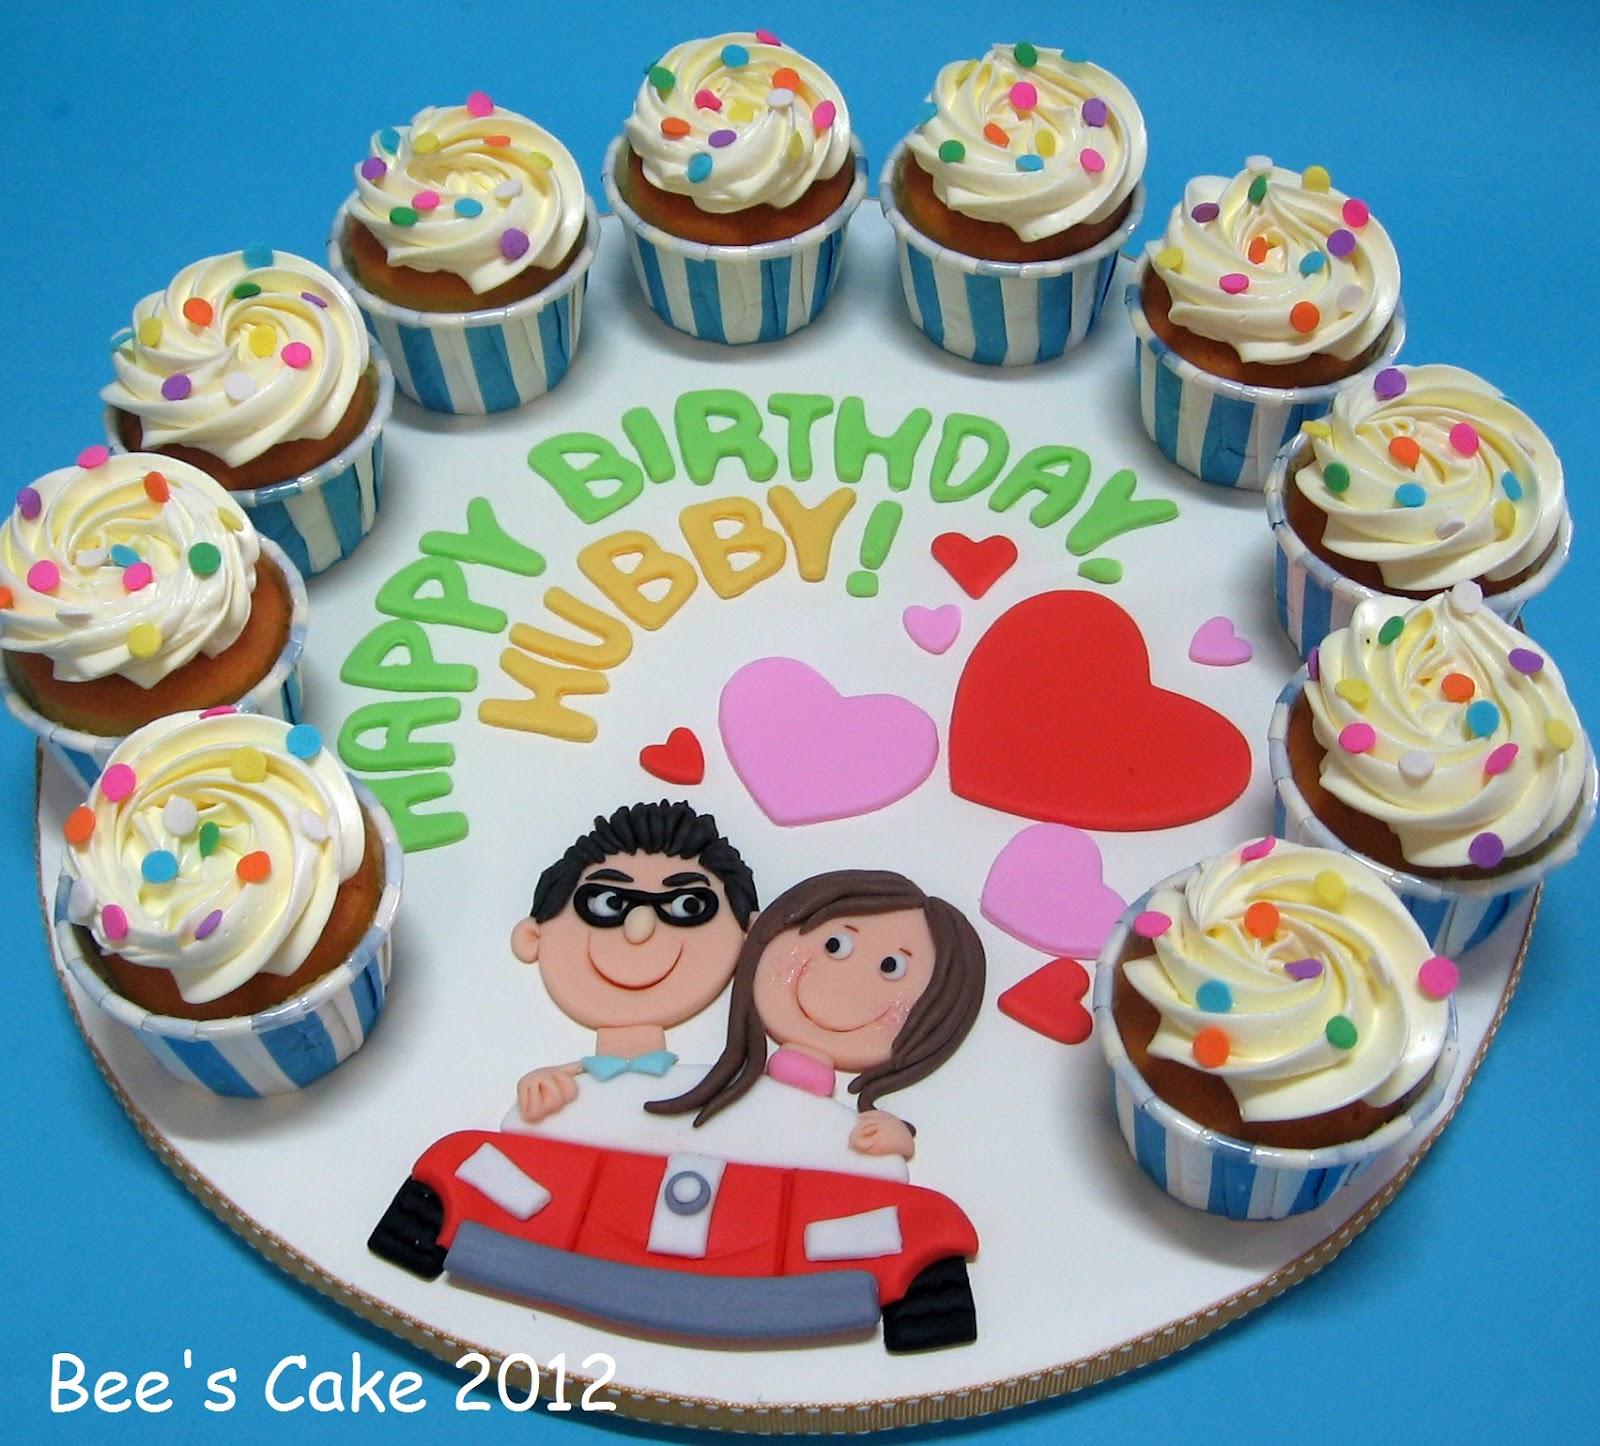 Bees Cake: Happy Birthday Hubby